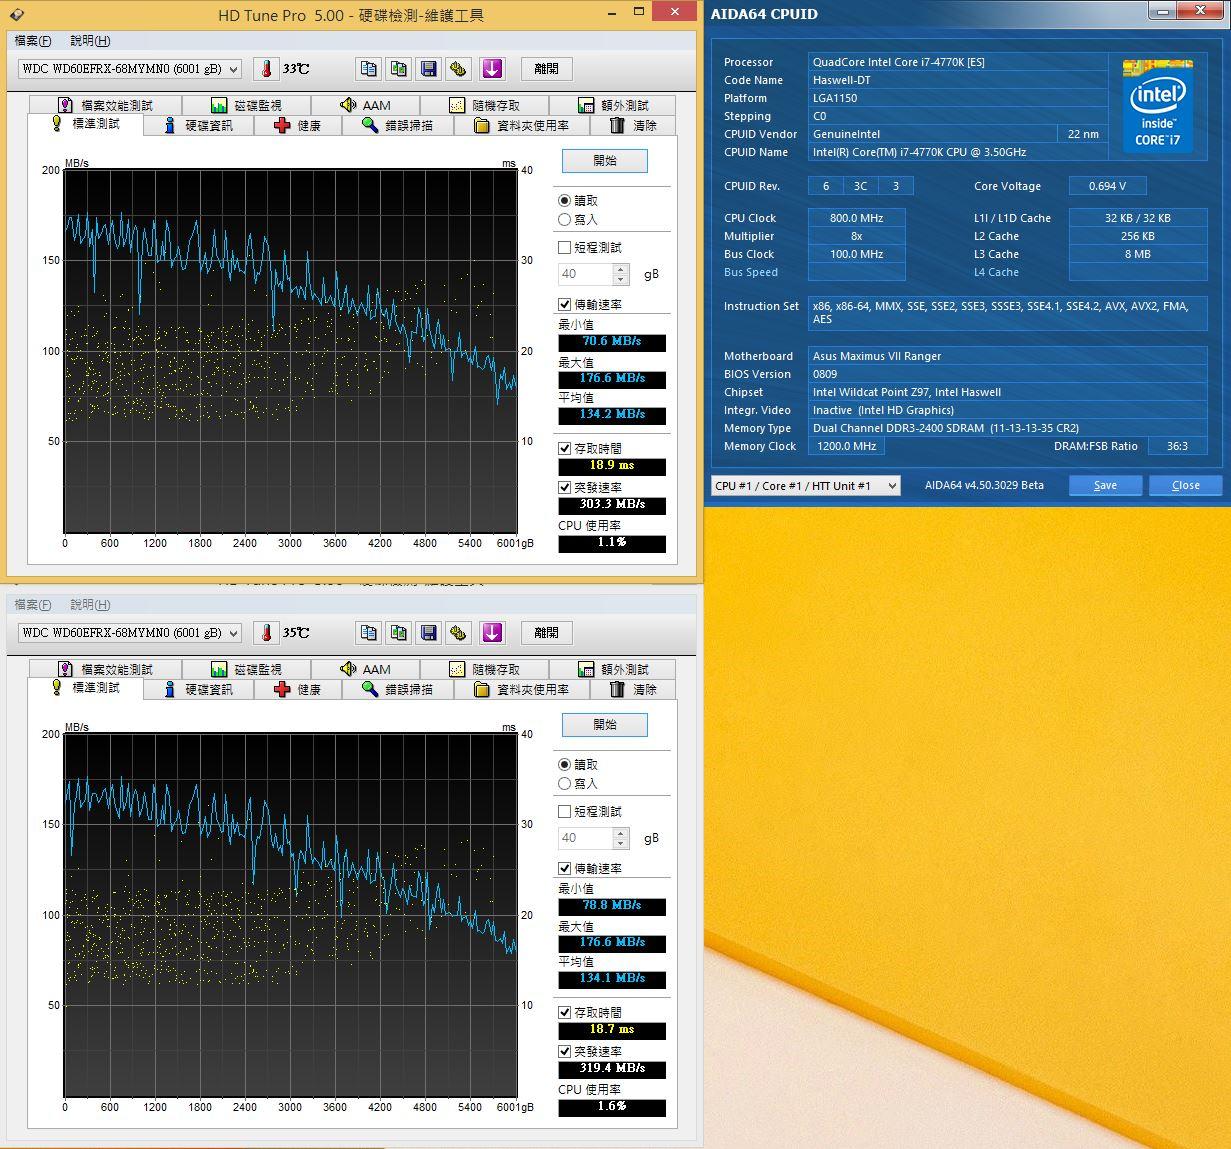 [XF] 迷人的大容量 牧場擴充省煩惱WD Red 6TB硬碟及Synology DS1513+ NAS應用實測